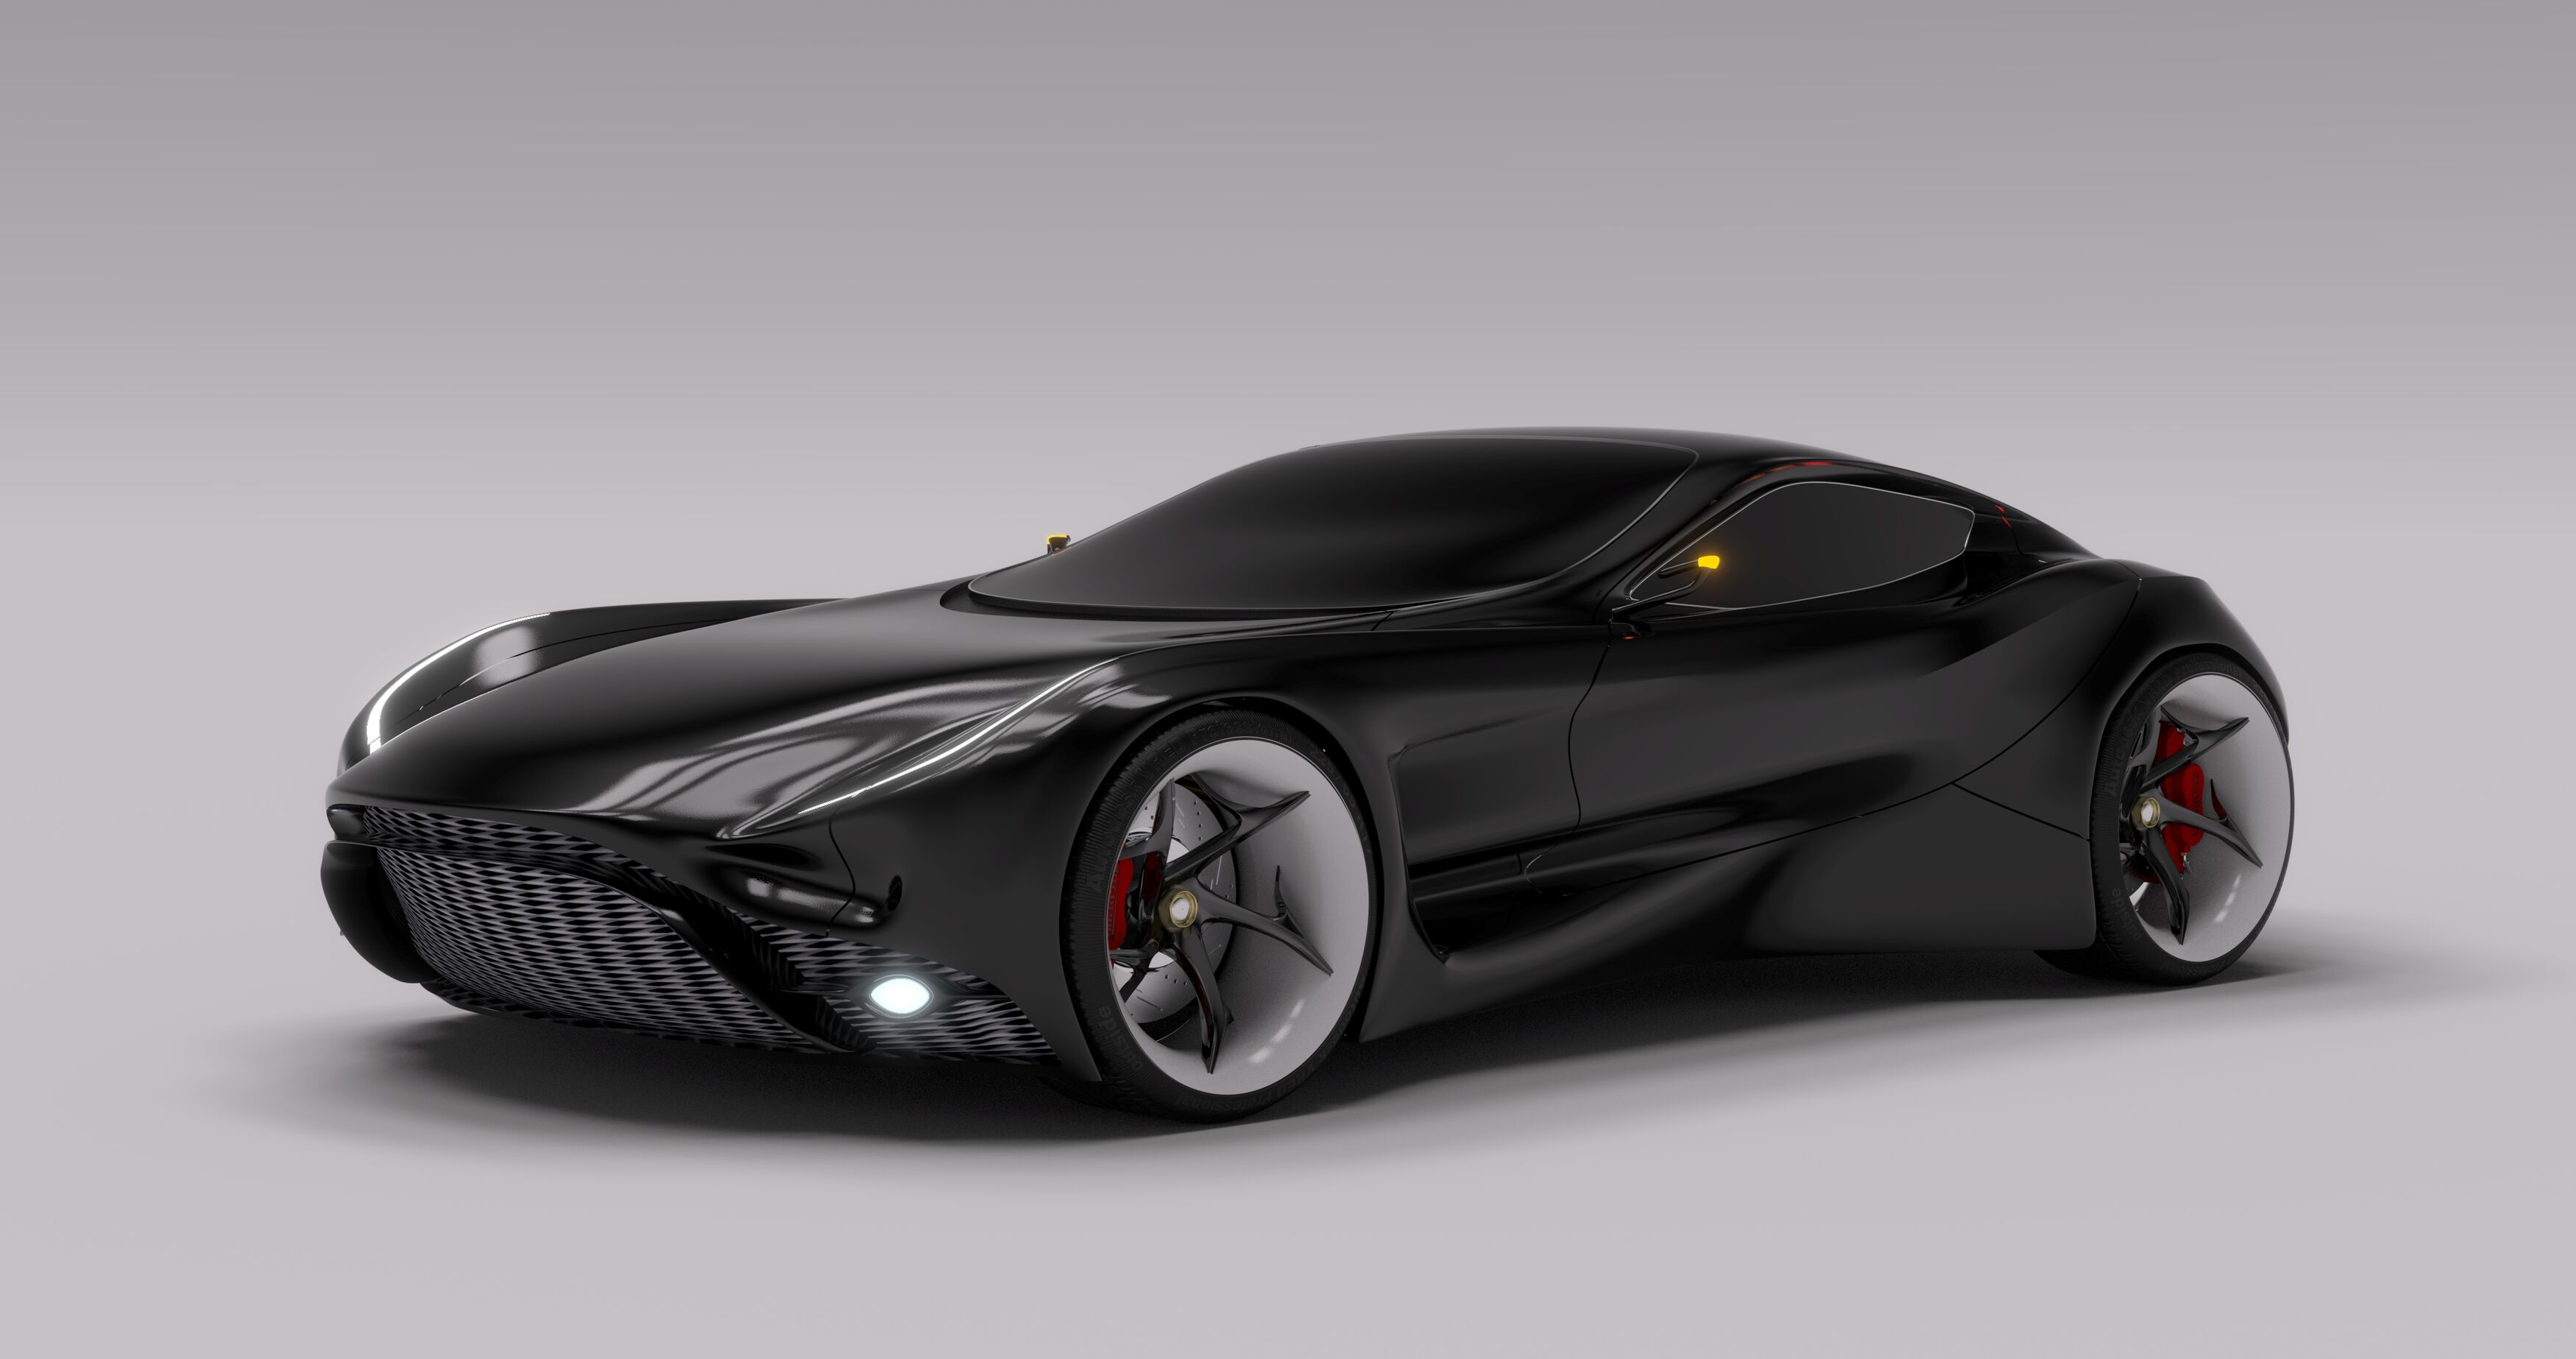 Aston-martin-db-zagato-x-3-3500-3500